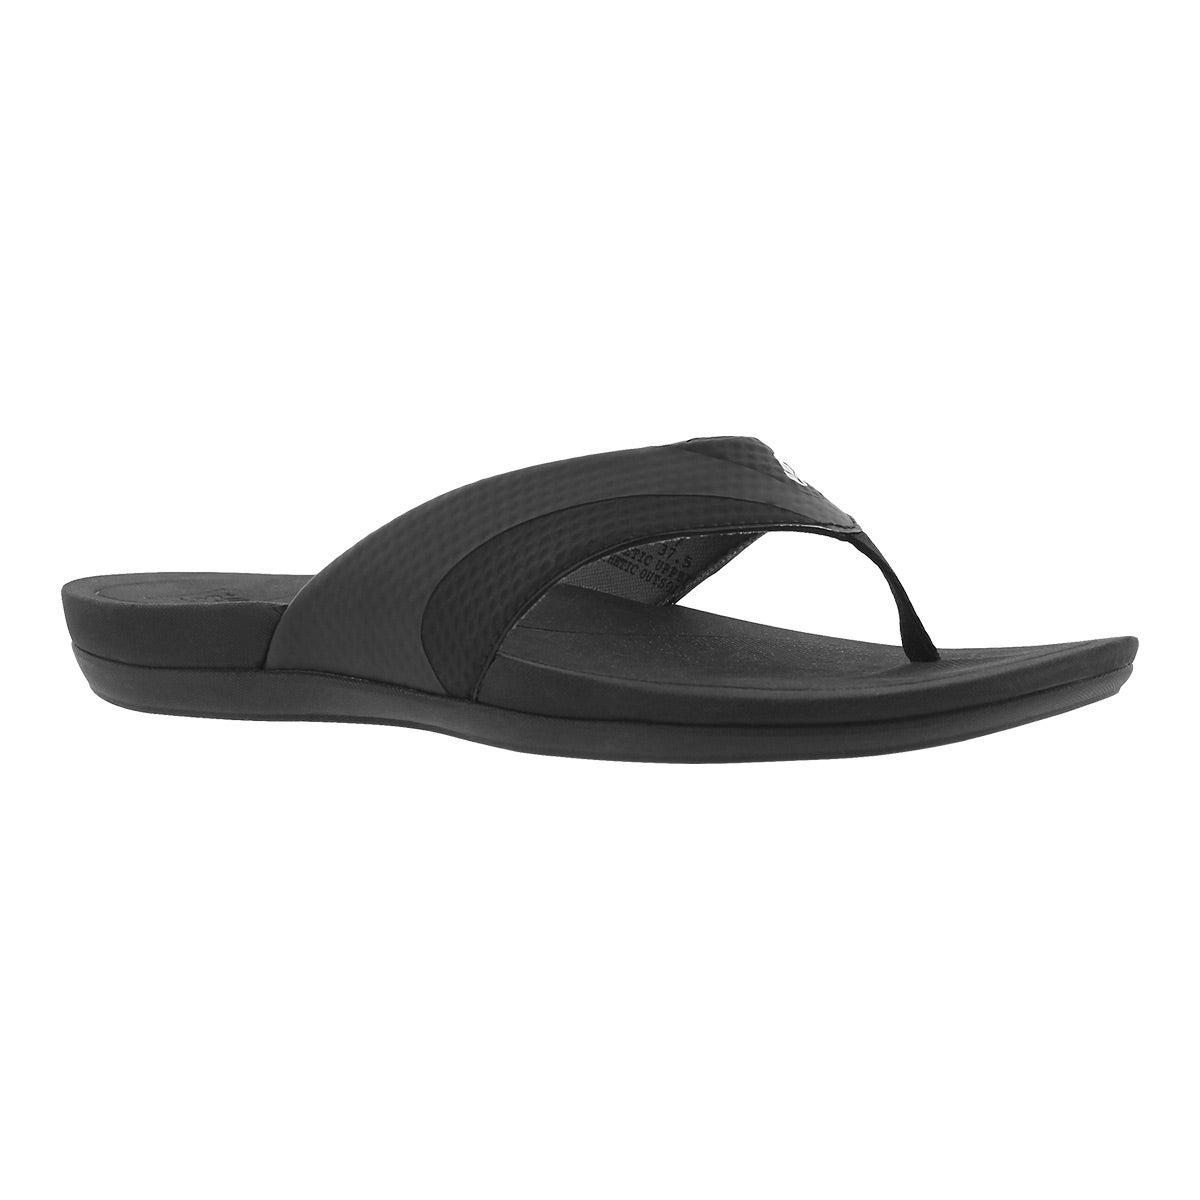 Women's ENERGY II black thong sandal